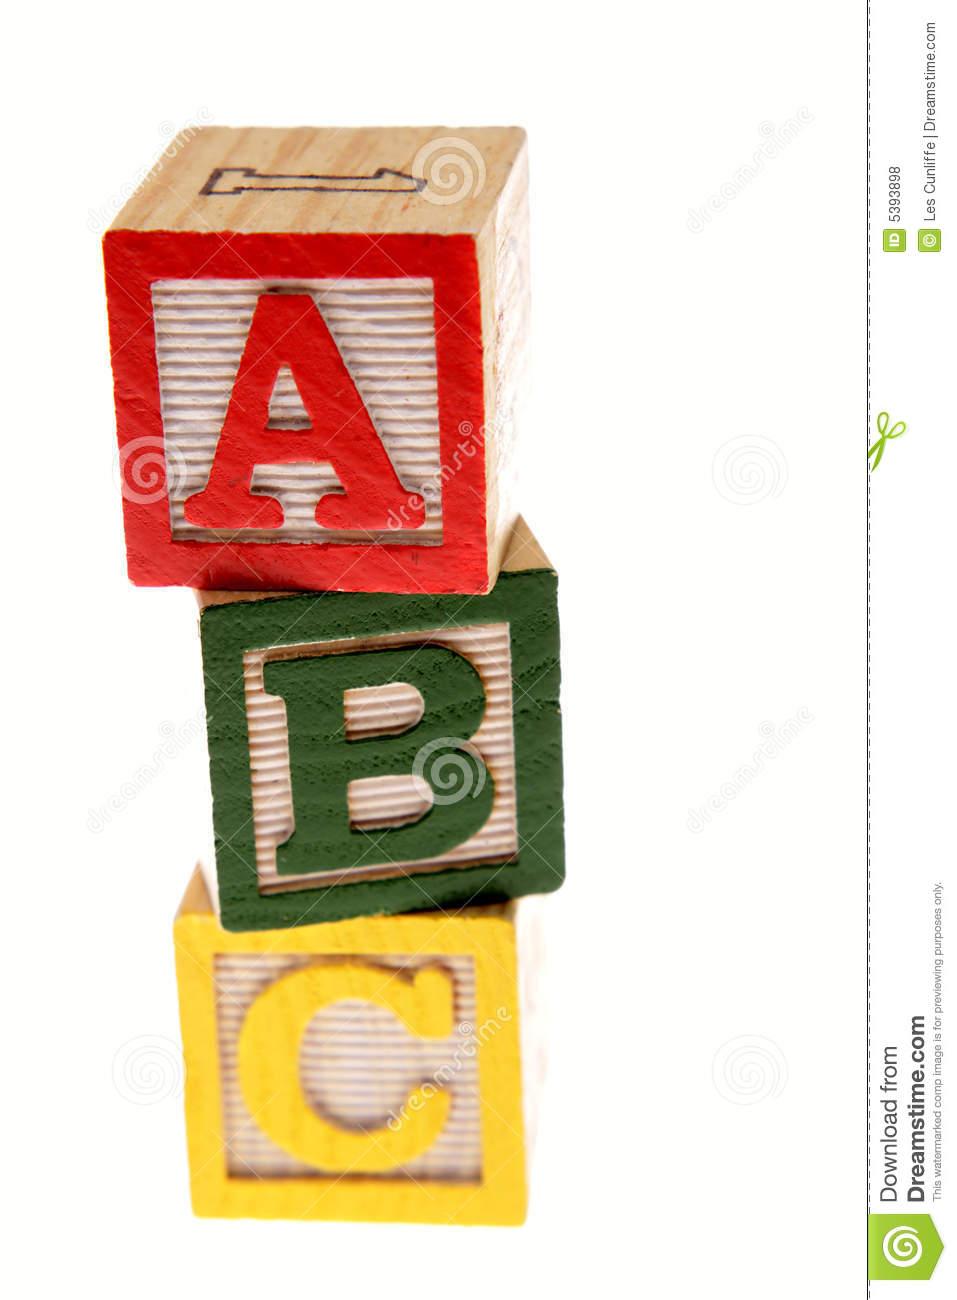 Abc Blocks Royalty Free Stock Photos   Image  5393898